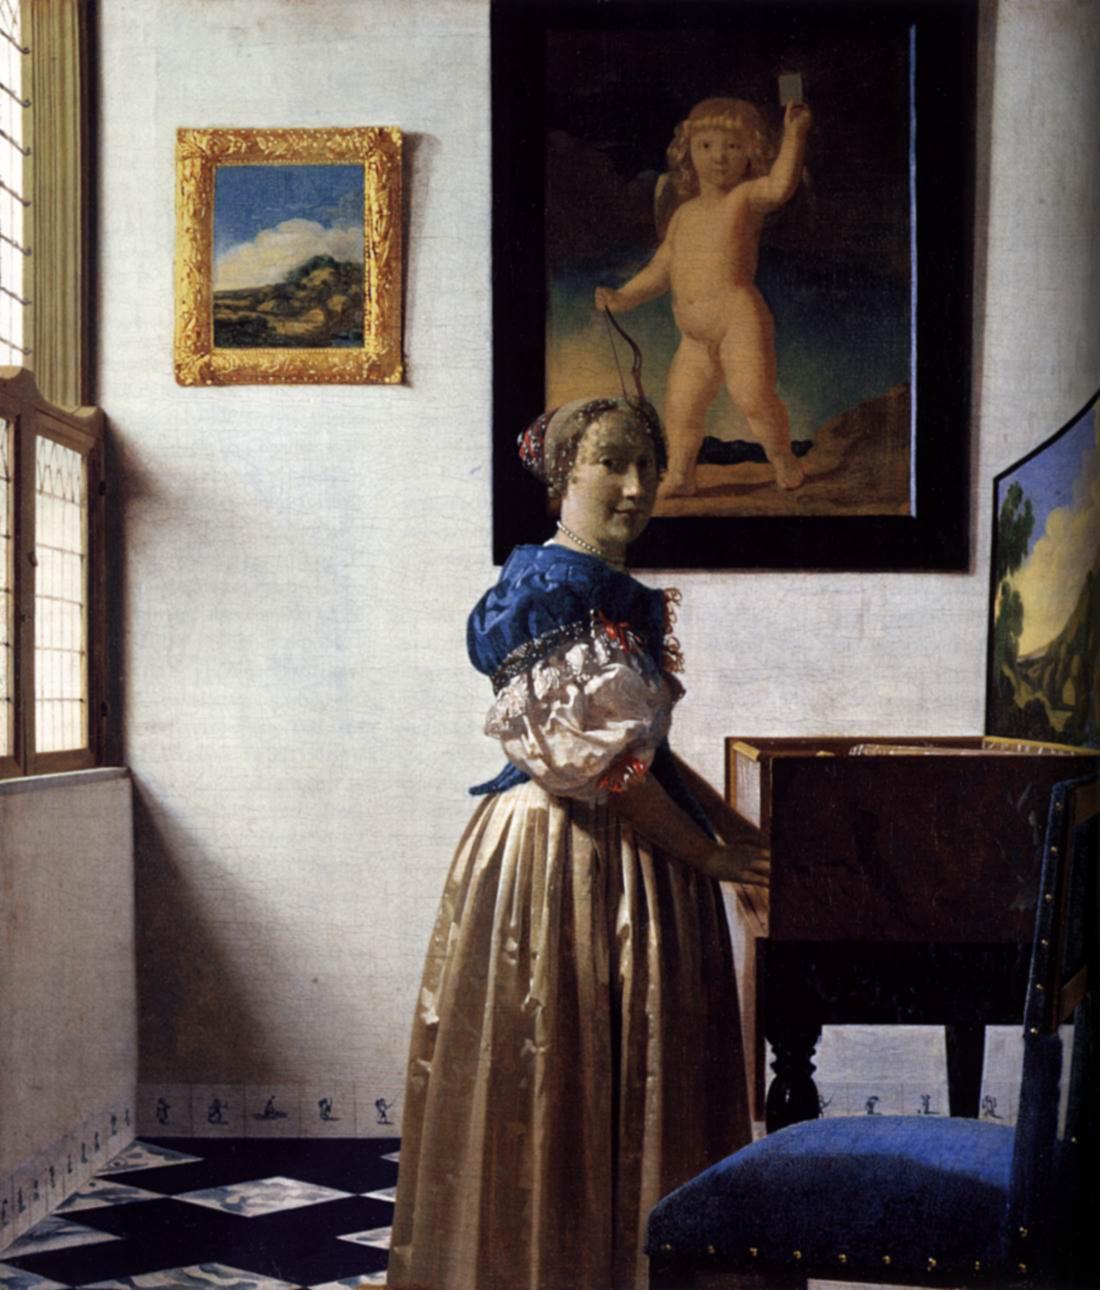 Mujer tocando un virginal, h. 1672-73, óleo sobre lienzo, Londres, National Gallery.